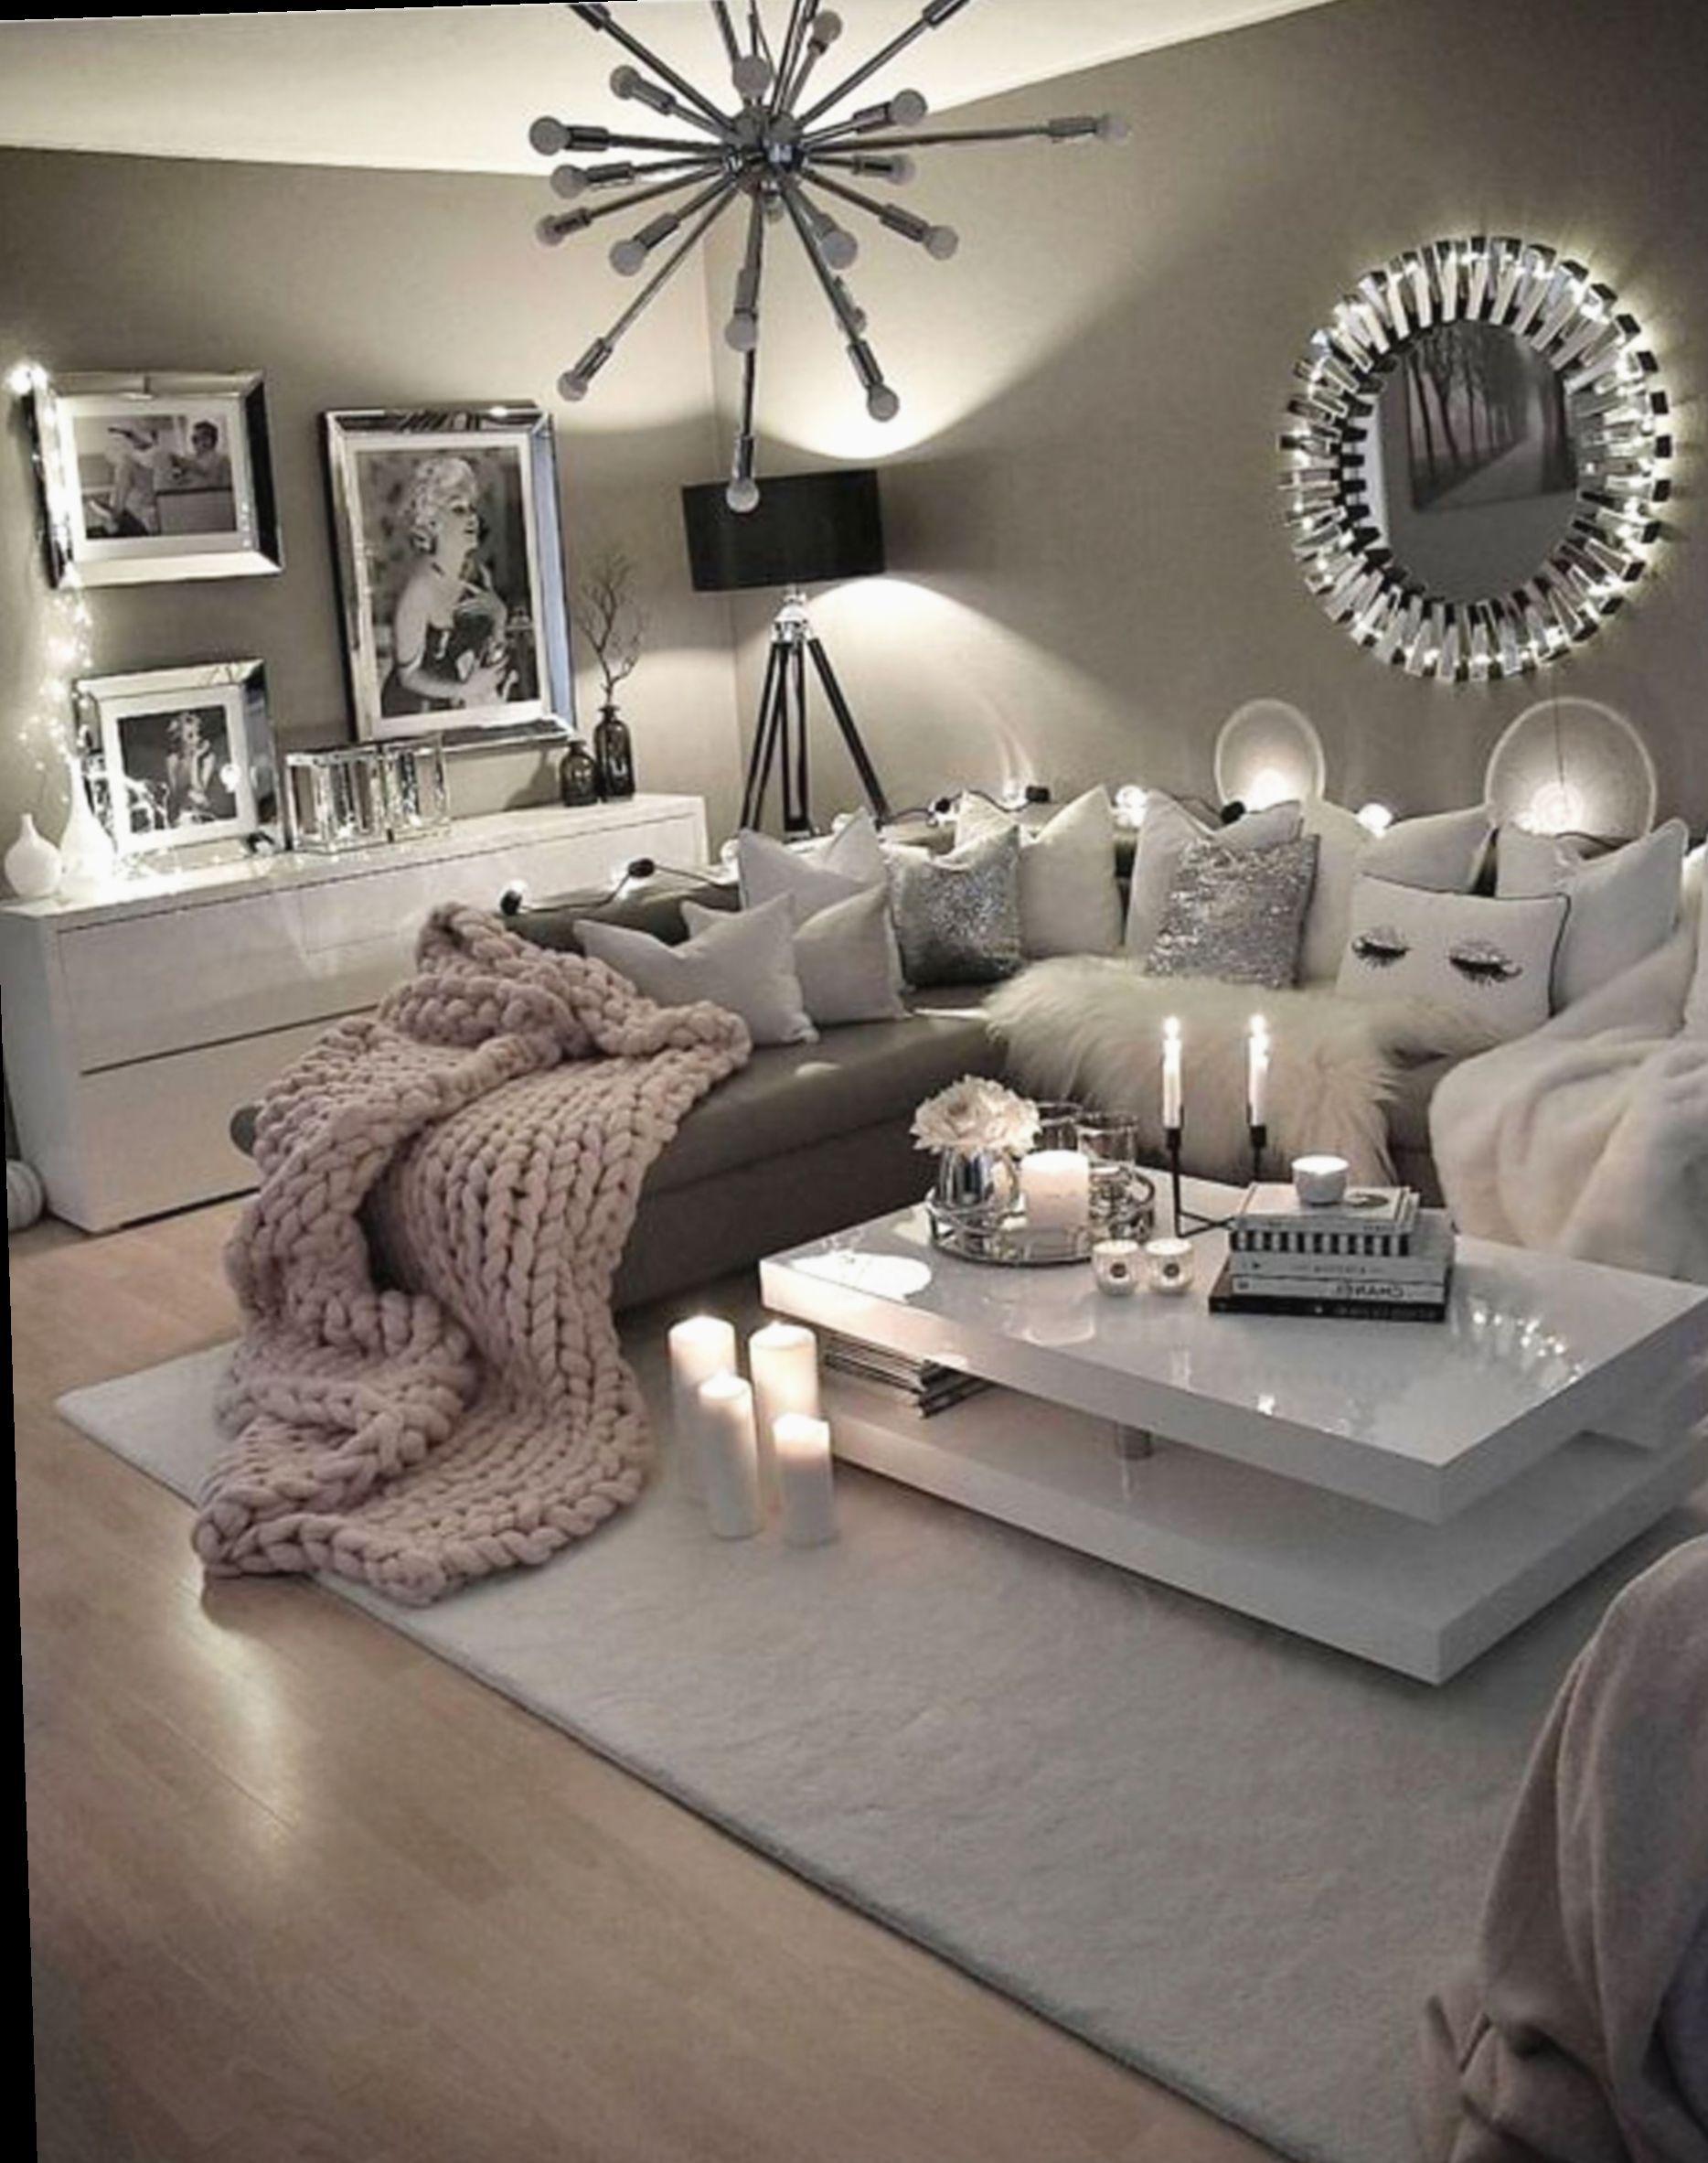 12 Cute Stuff Girly Room Decor Teenroomdecor Cozy Grey Living